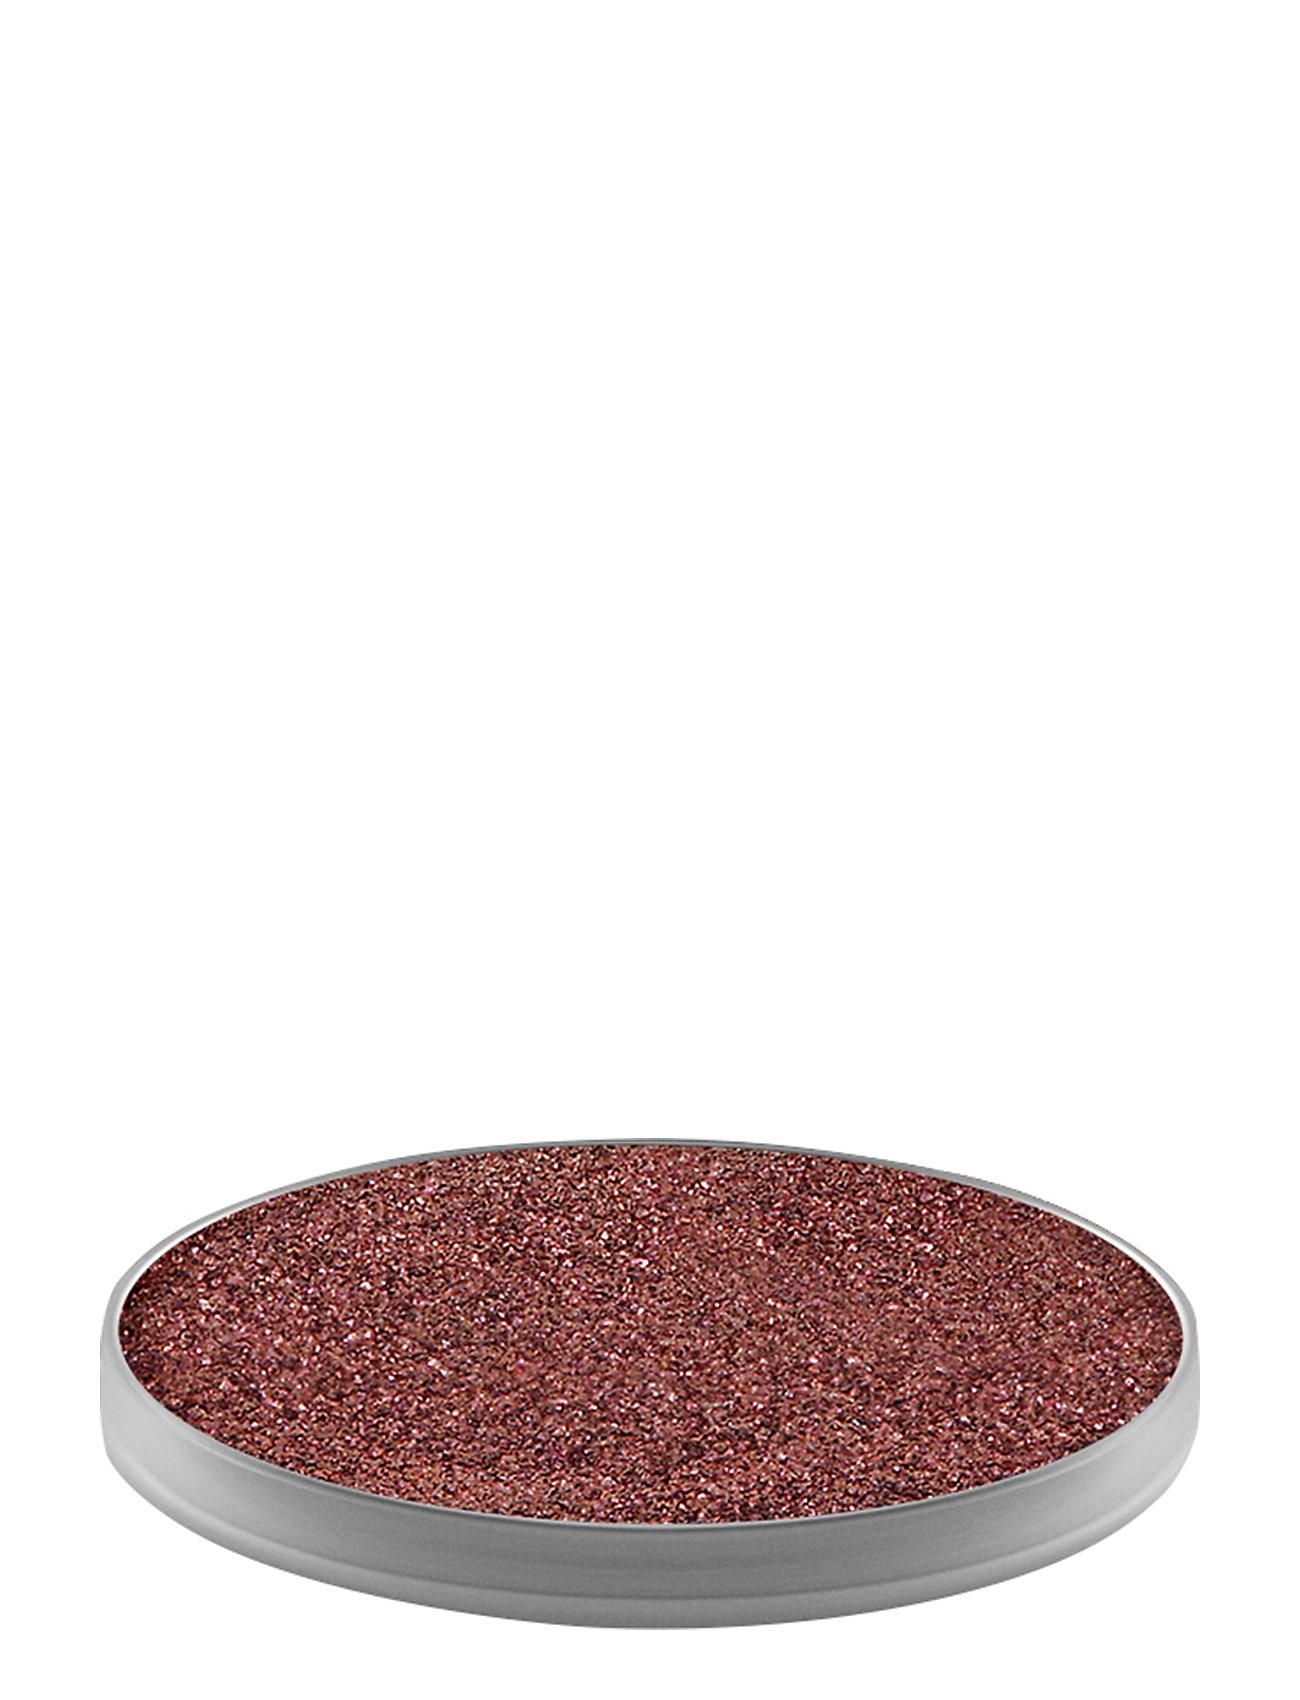 Image of Dazzleshadow Extreme Pro Palett Beauty WOMEN Makeup Eyes Eyeshadow - Not Palettes Rød M.A.C. (3366815277)